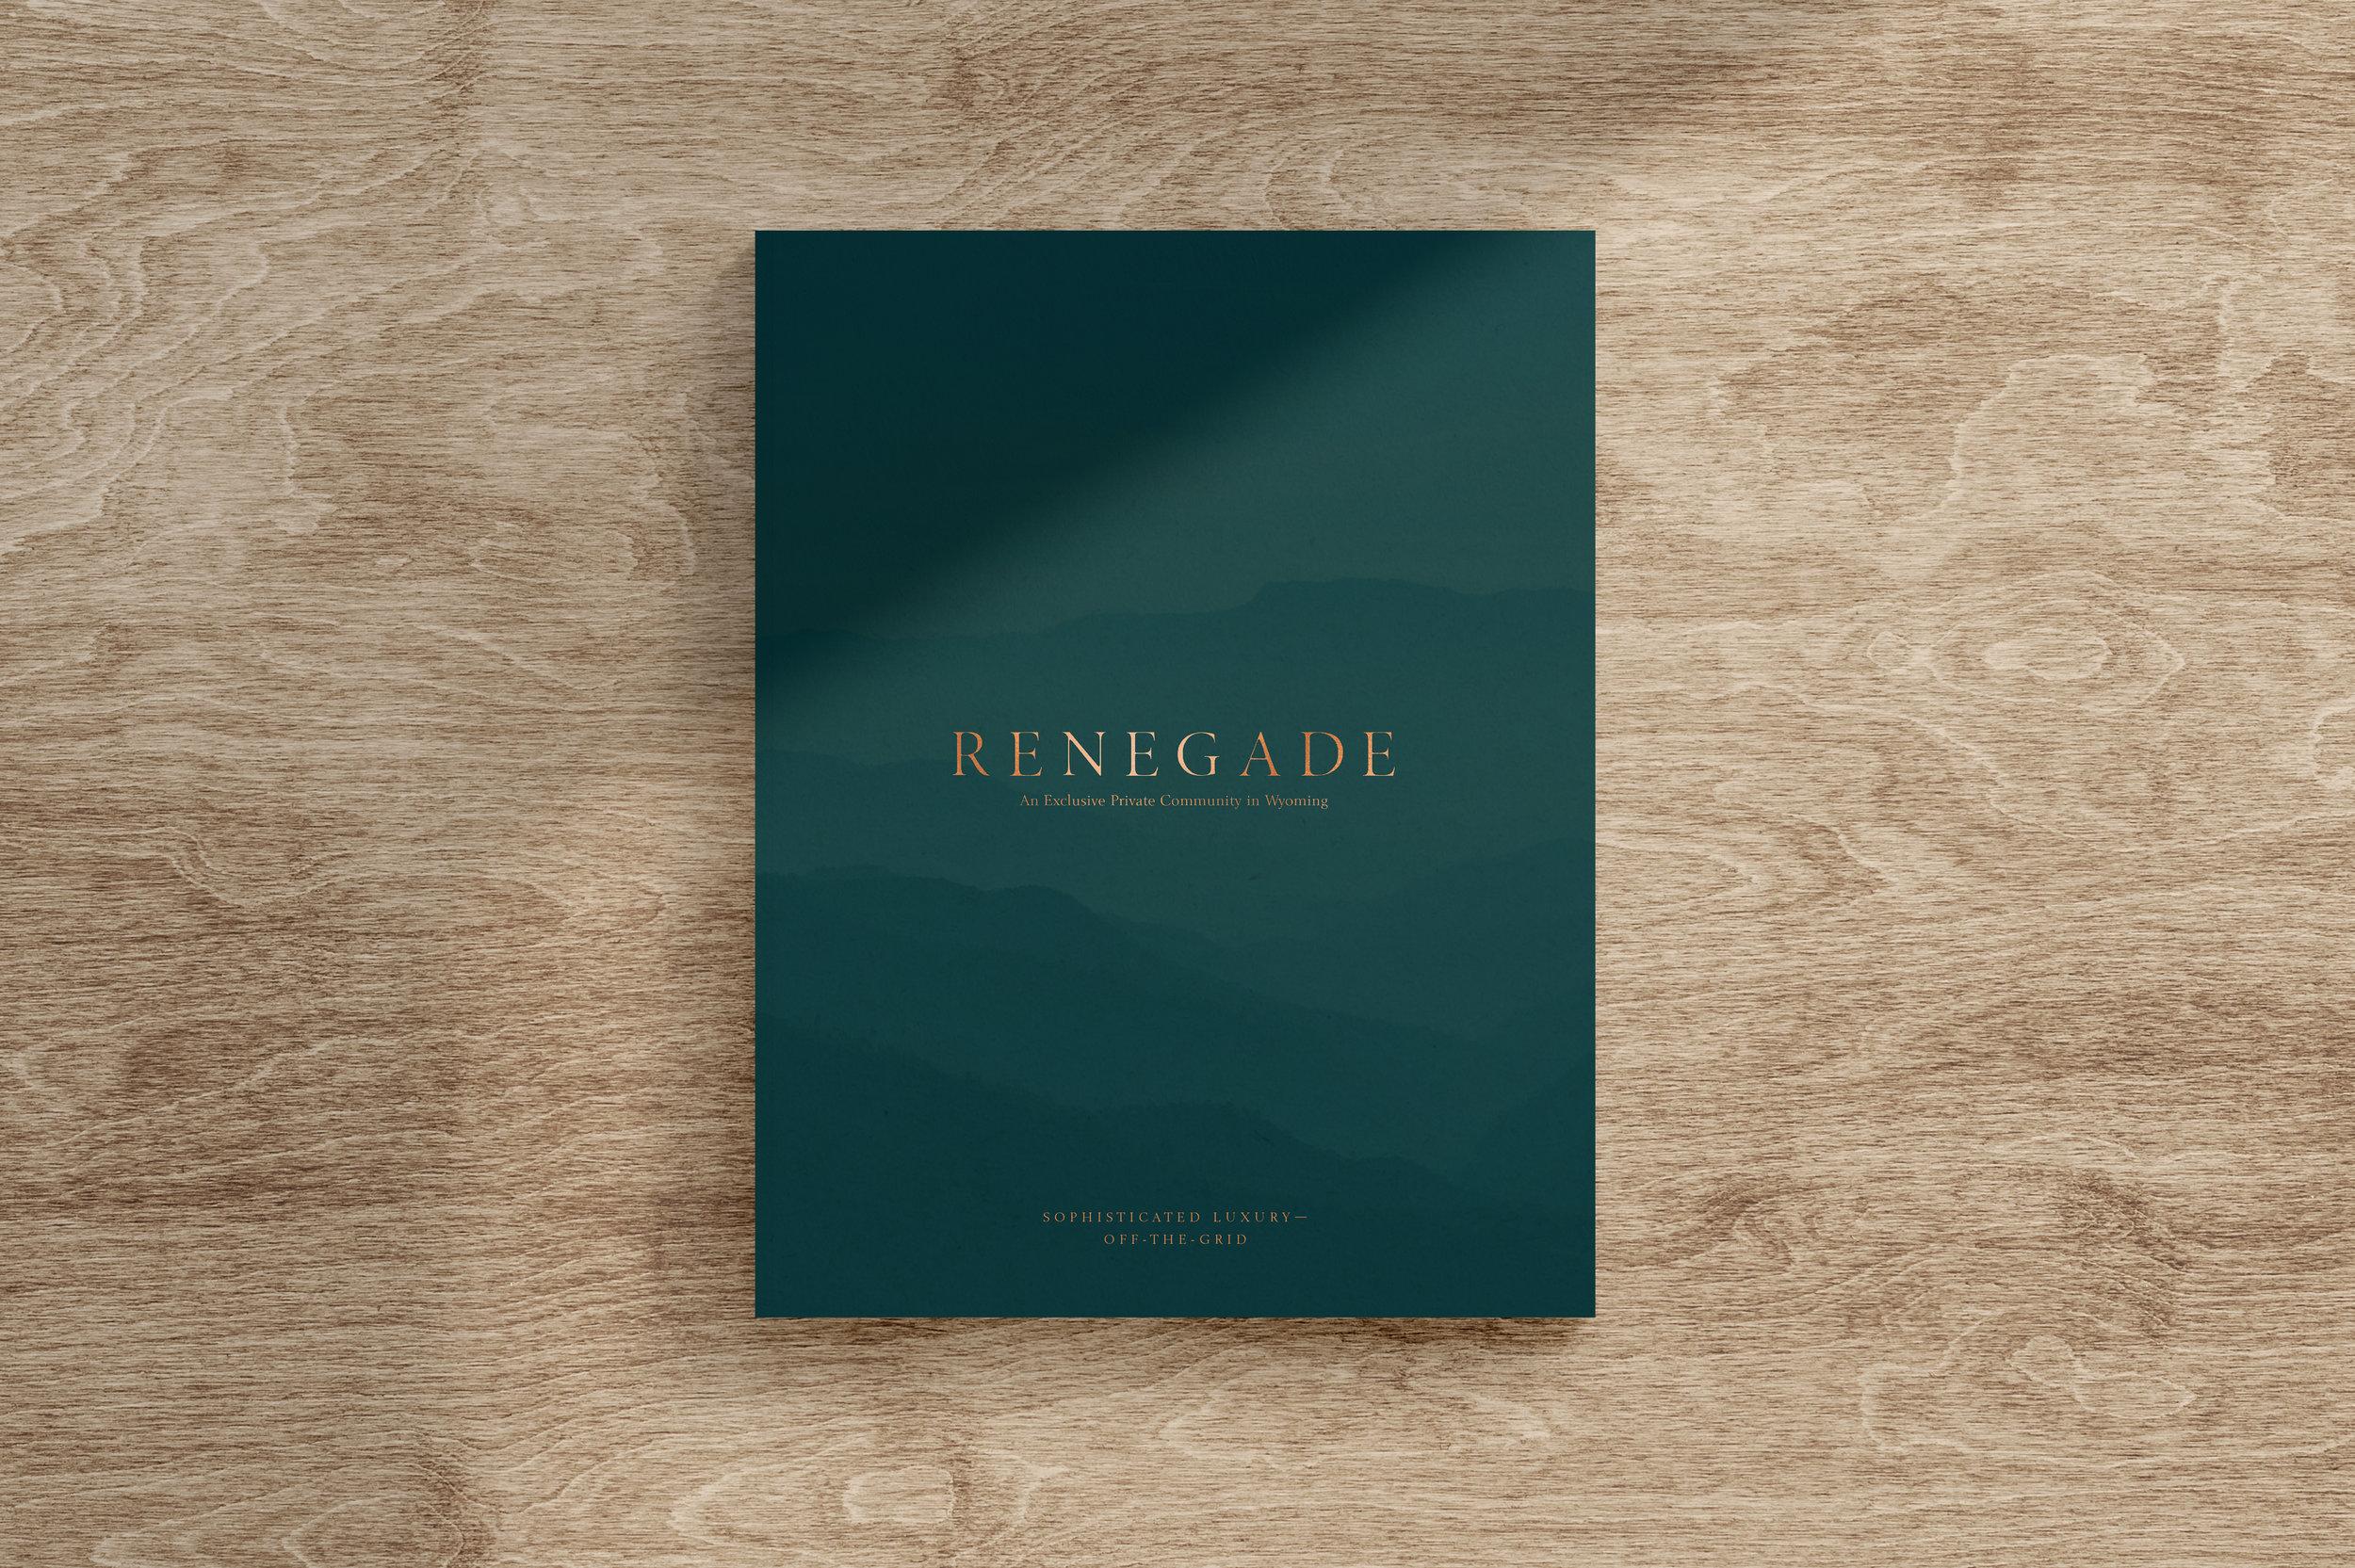 RenegadeCover.jpg